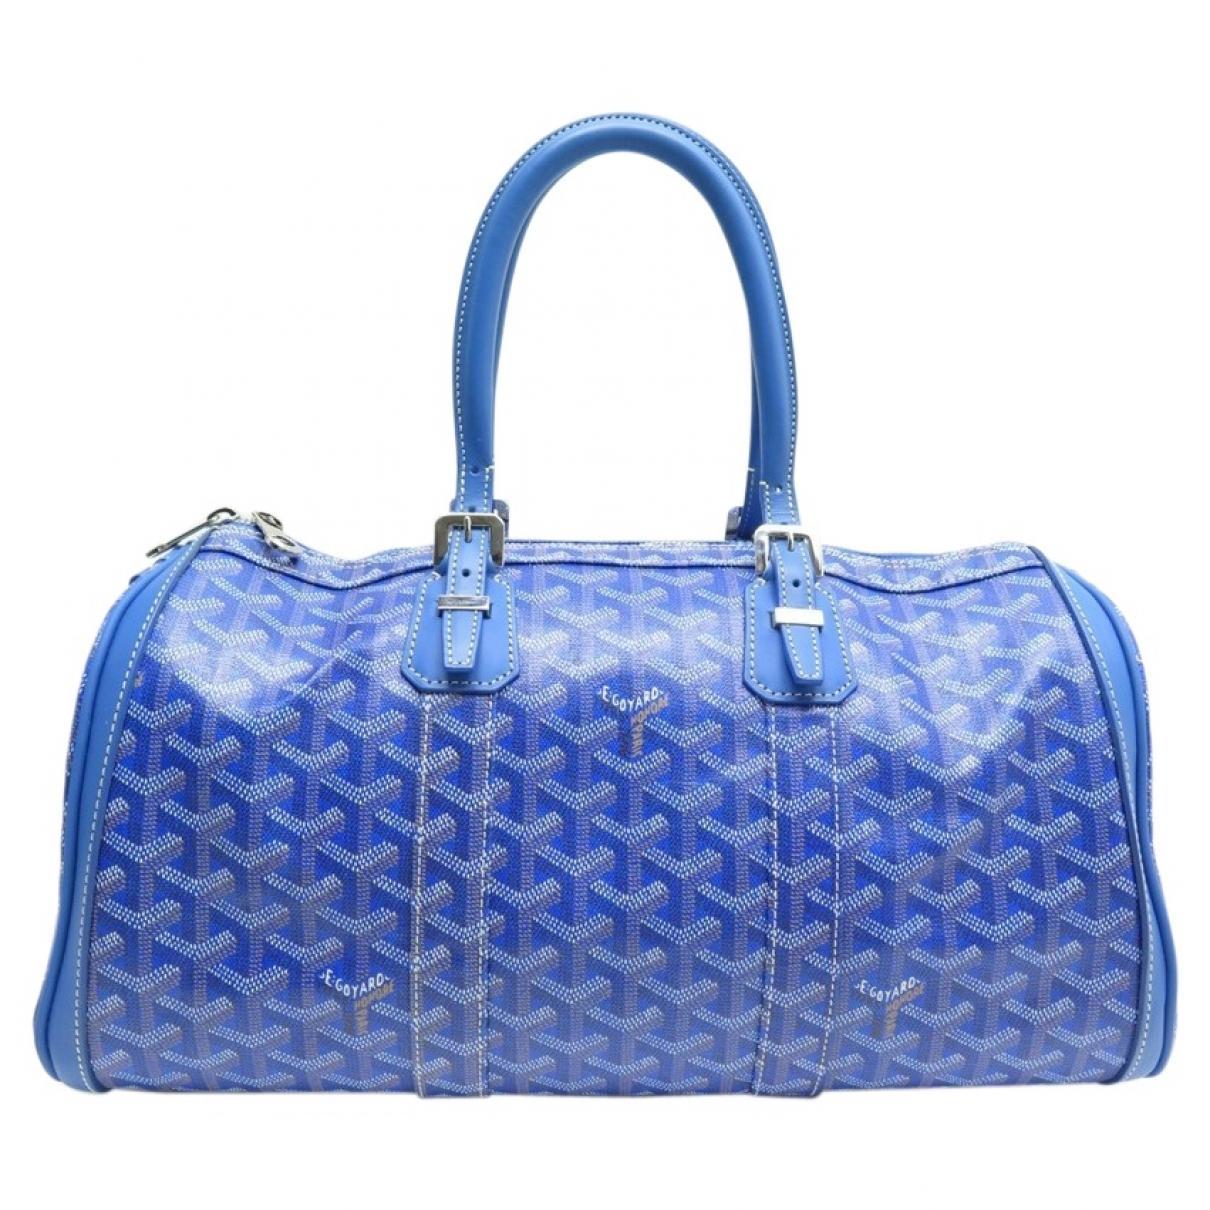 b4d400990 Goyard Croisière Blue Cloth Travel Bag in Blue - Lyst